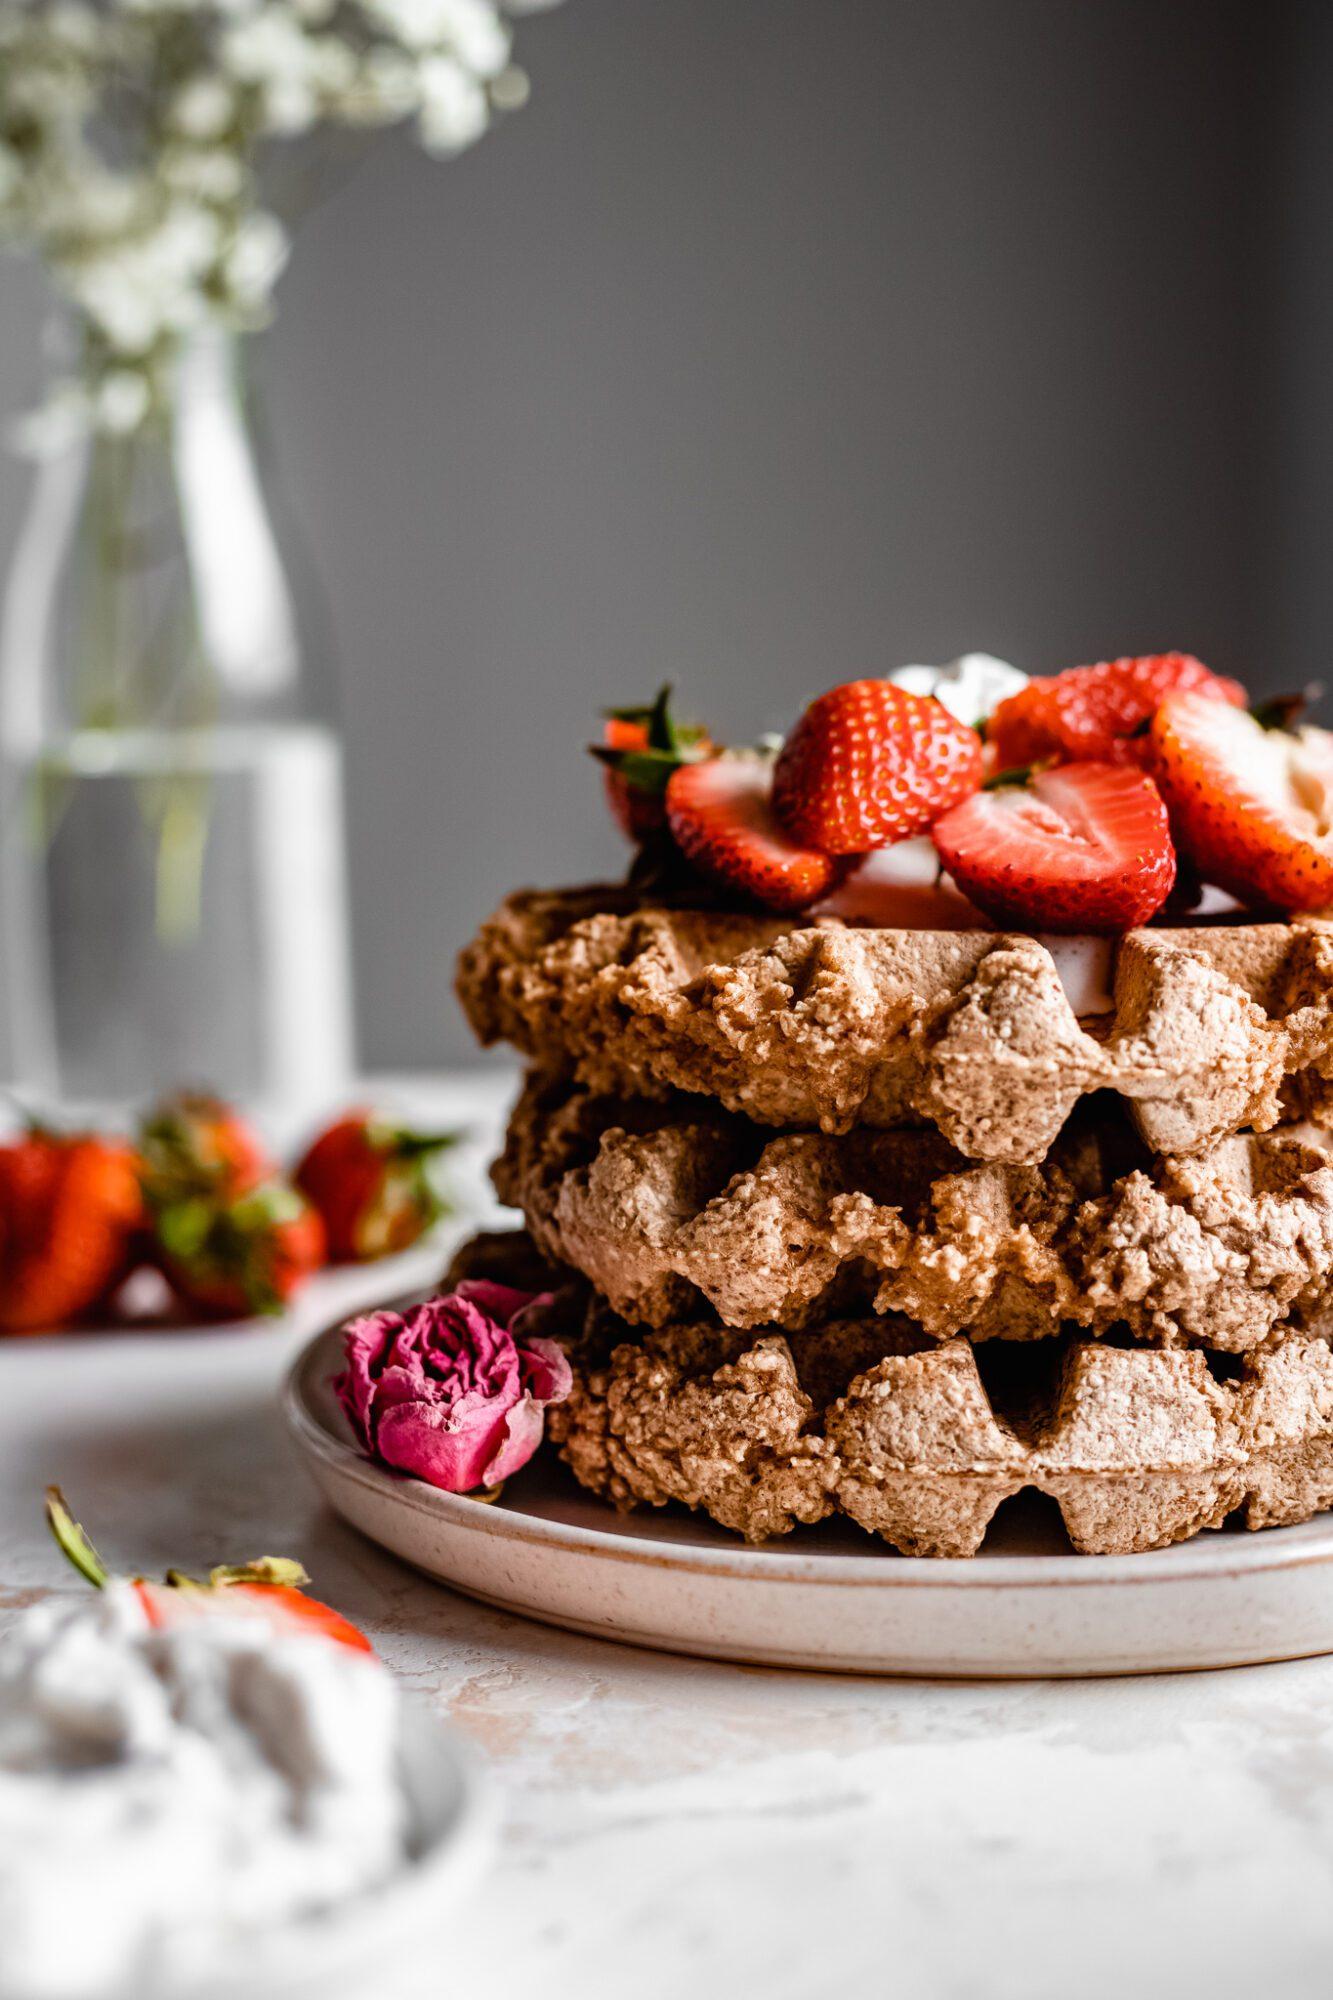 stack of vegan waffles